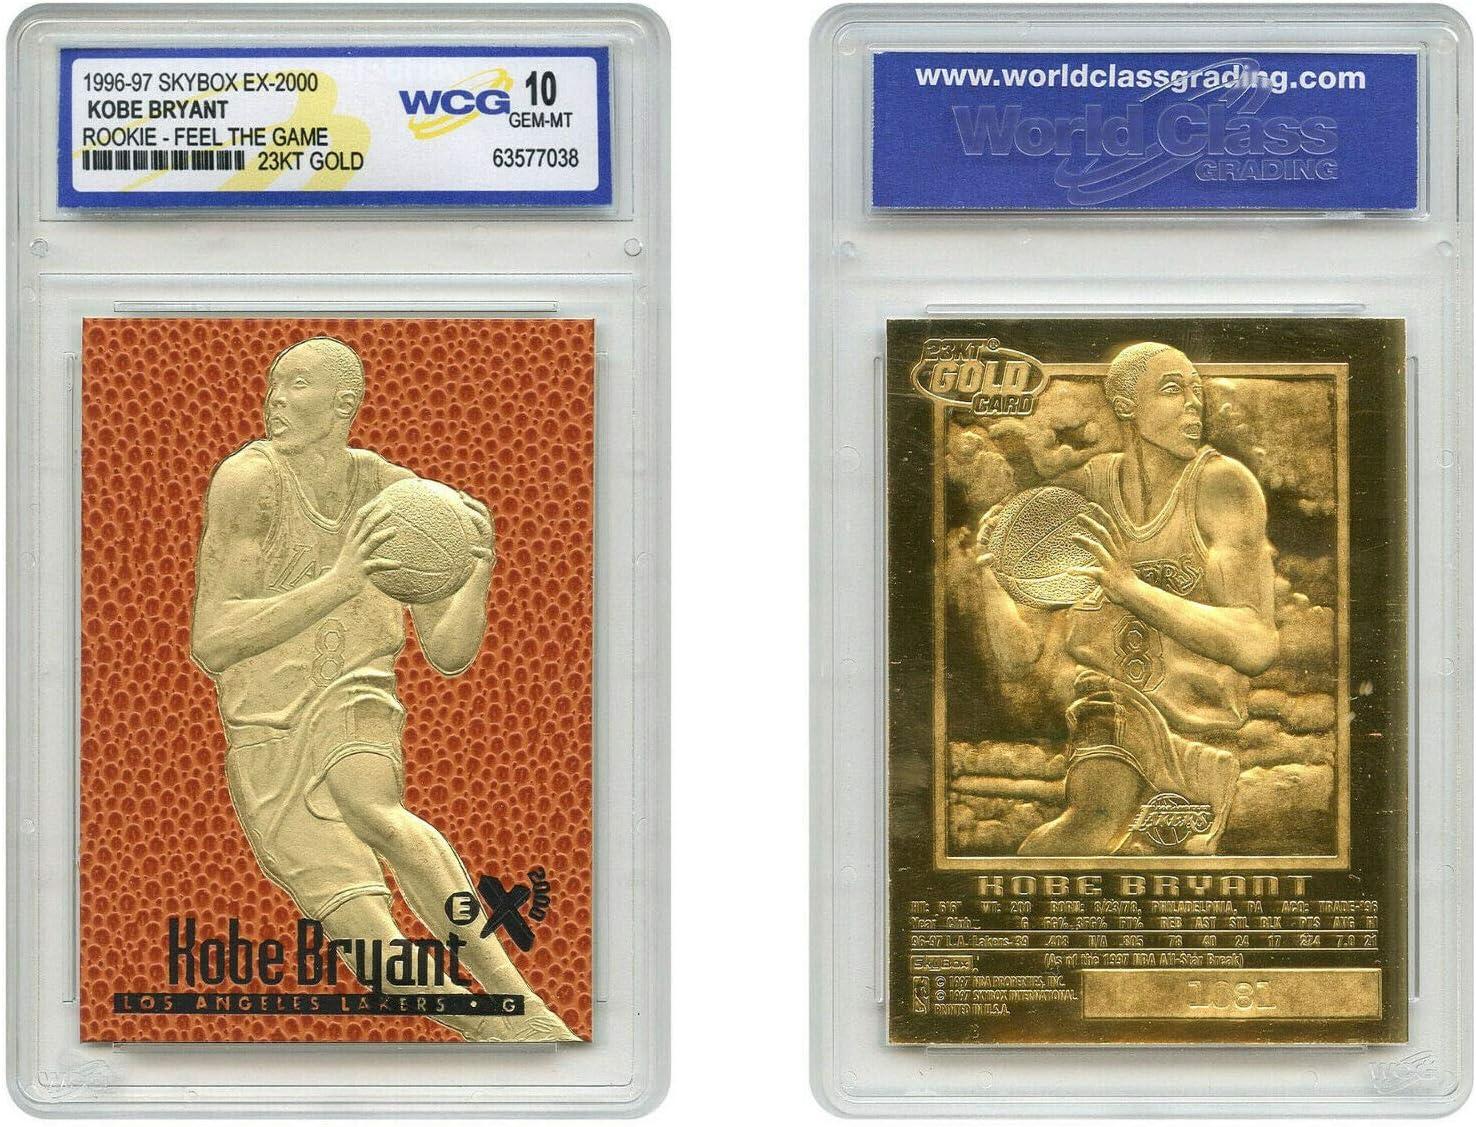 Kobe Bryant Surprise price 1996-97 SKYBOX EX-2000 Rookie 23K GEM Gifts Gold WCG Card